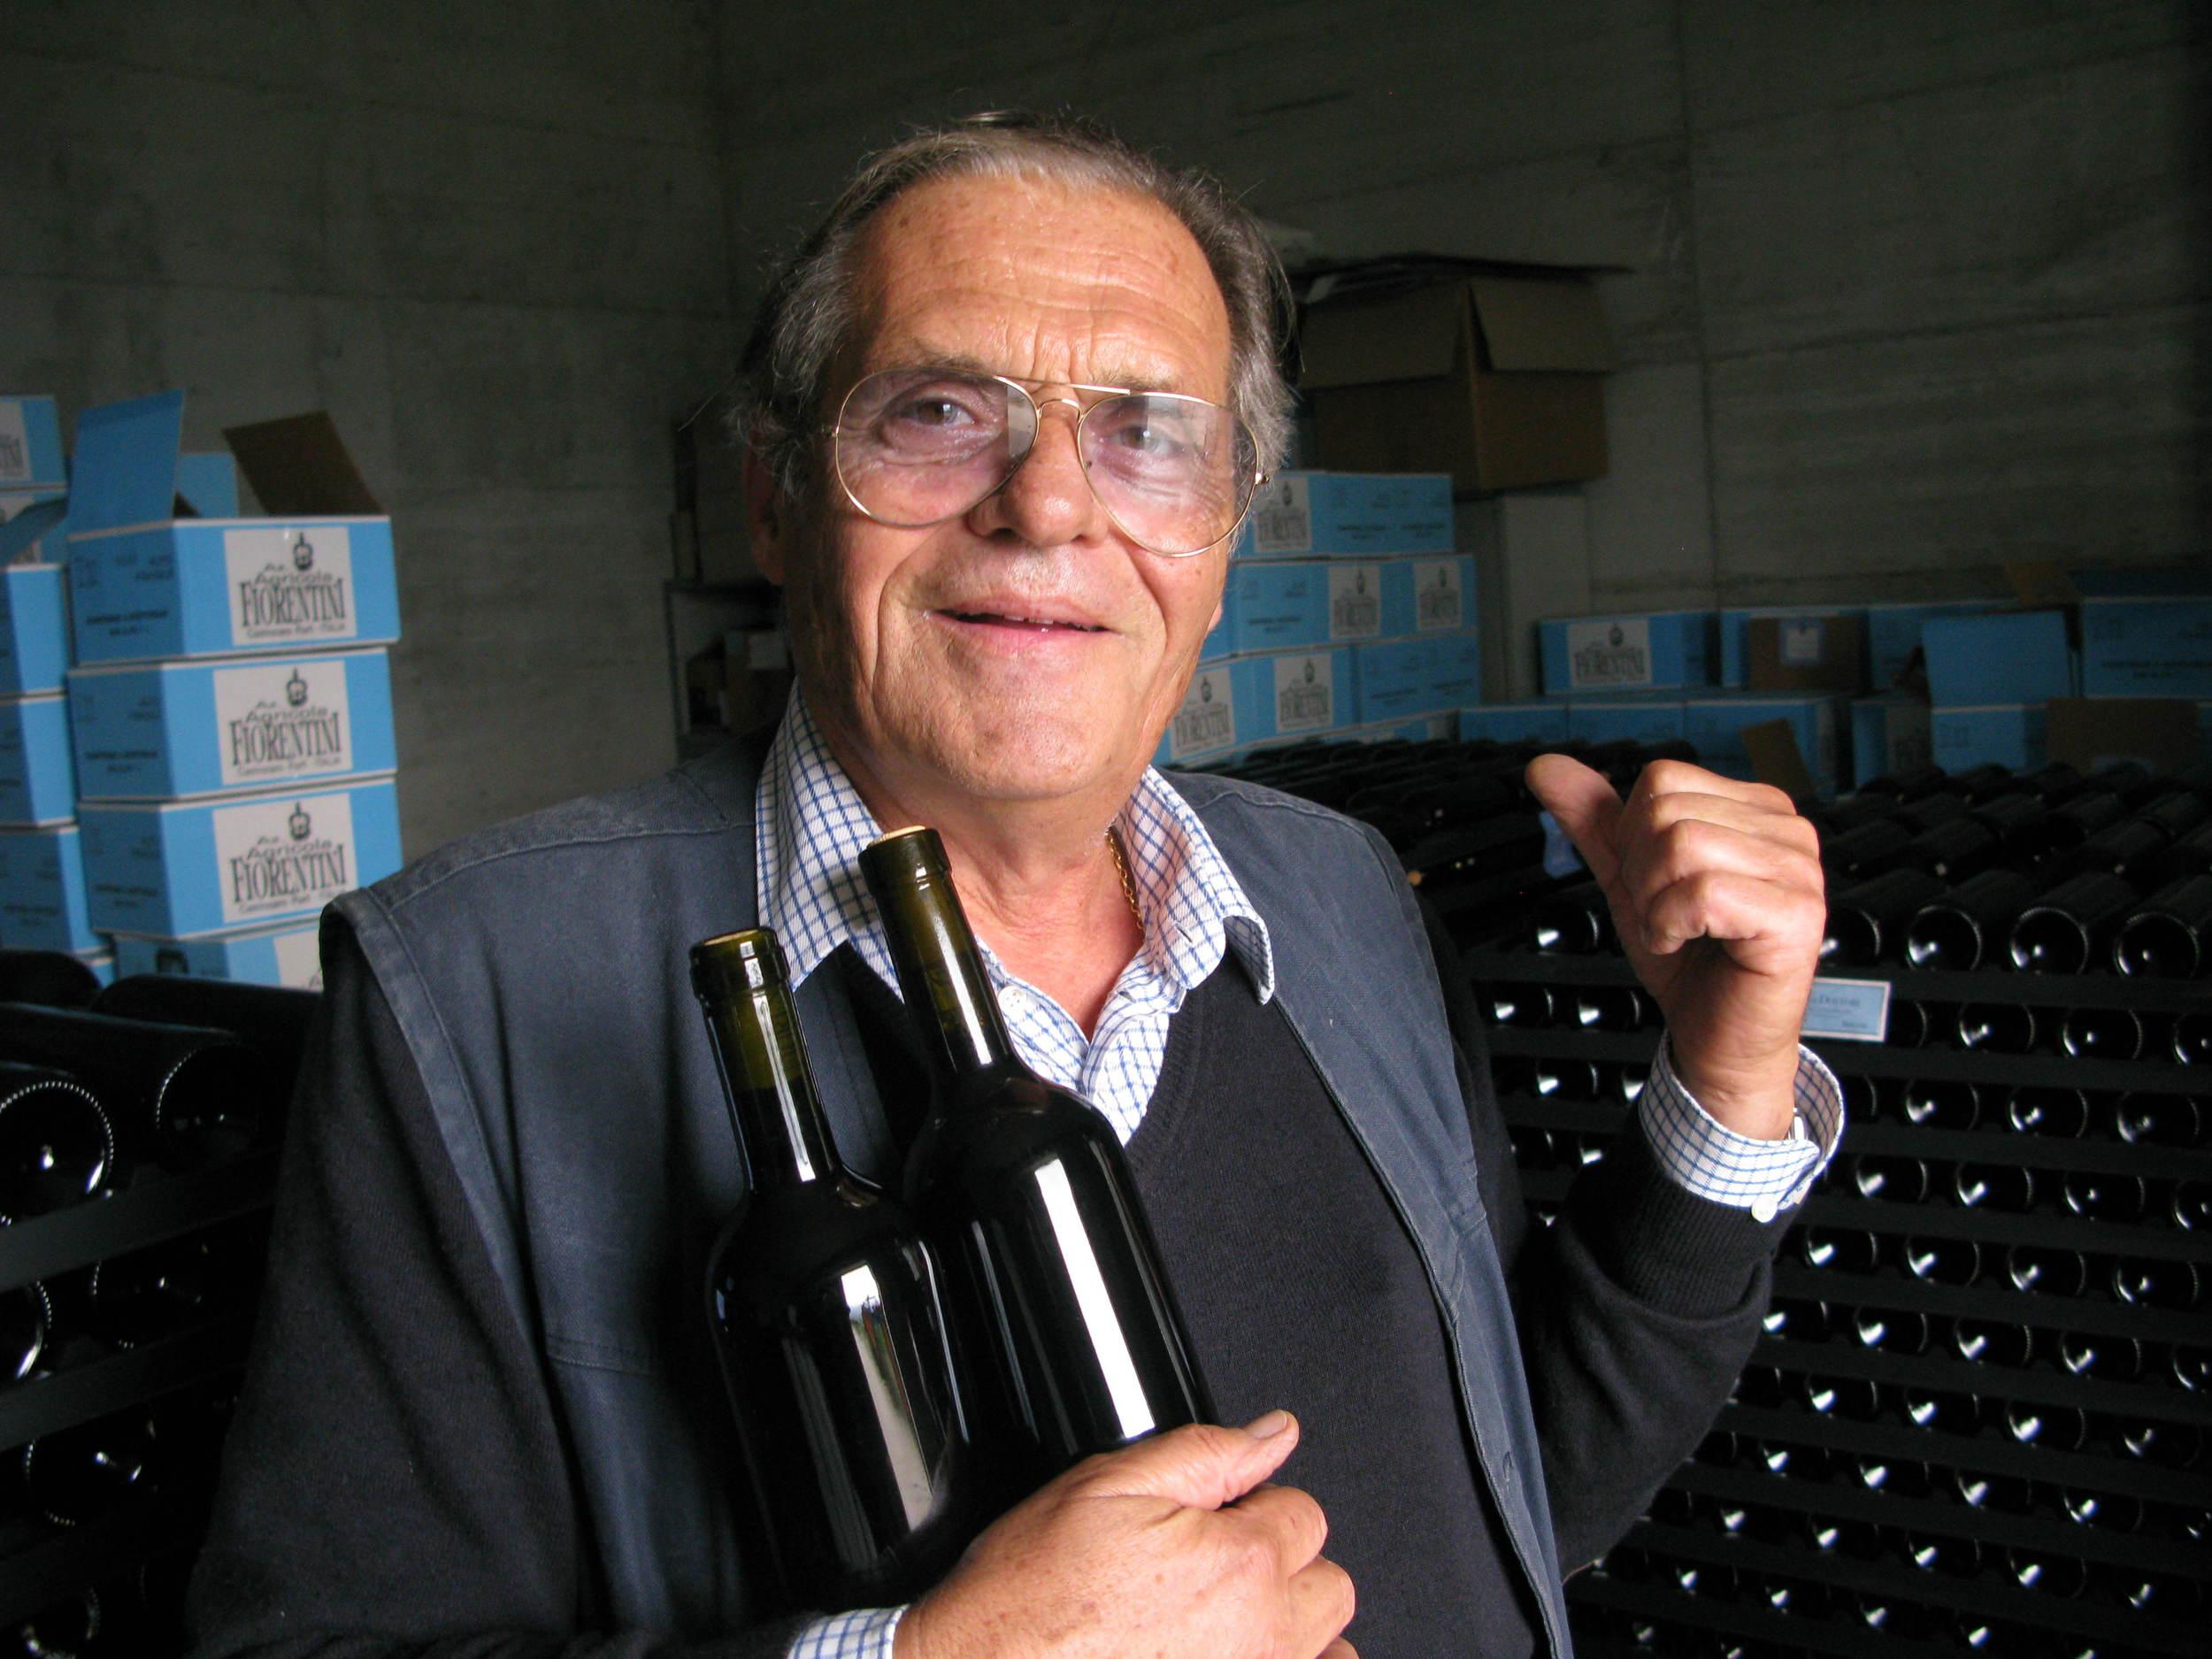 Hospital doctor turned winemaker